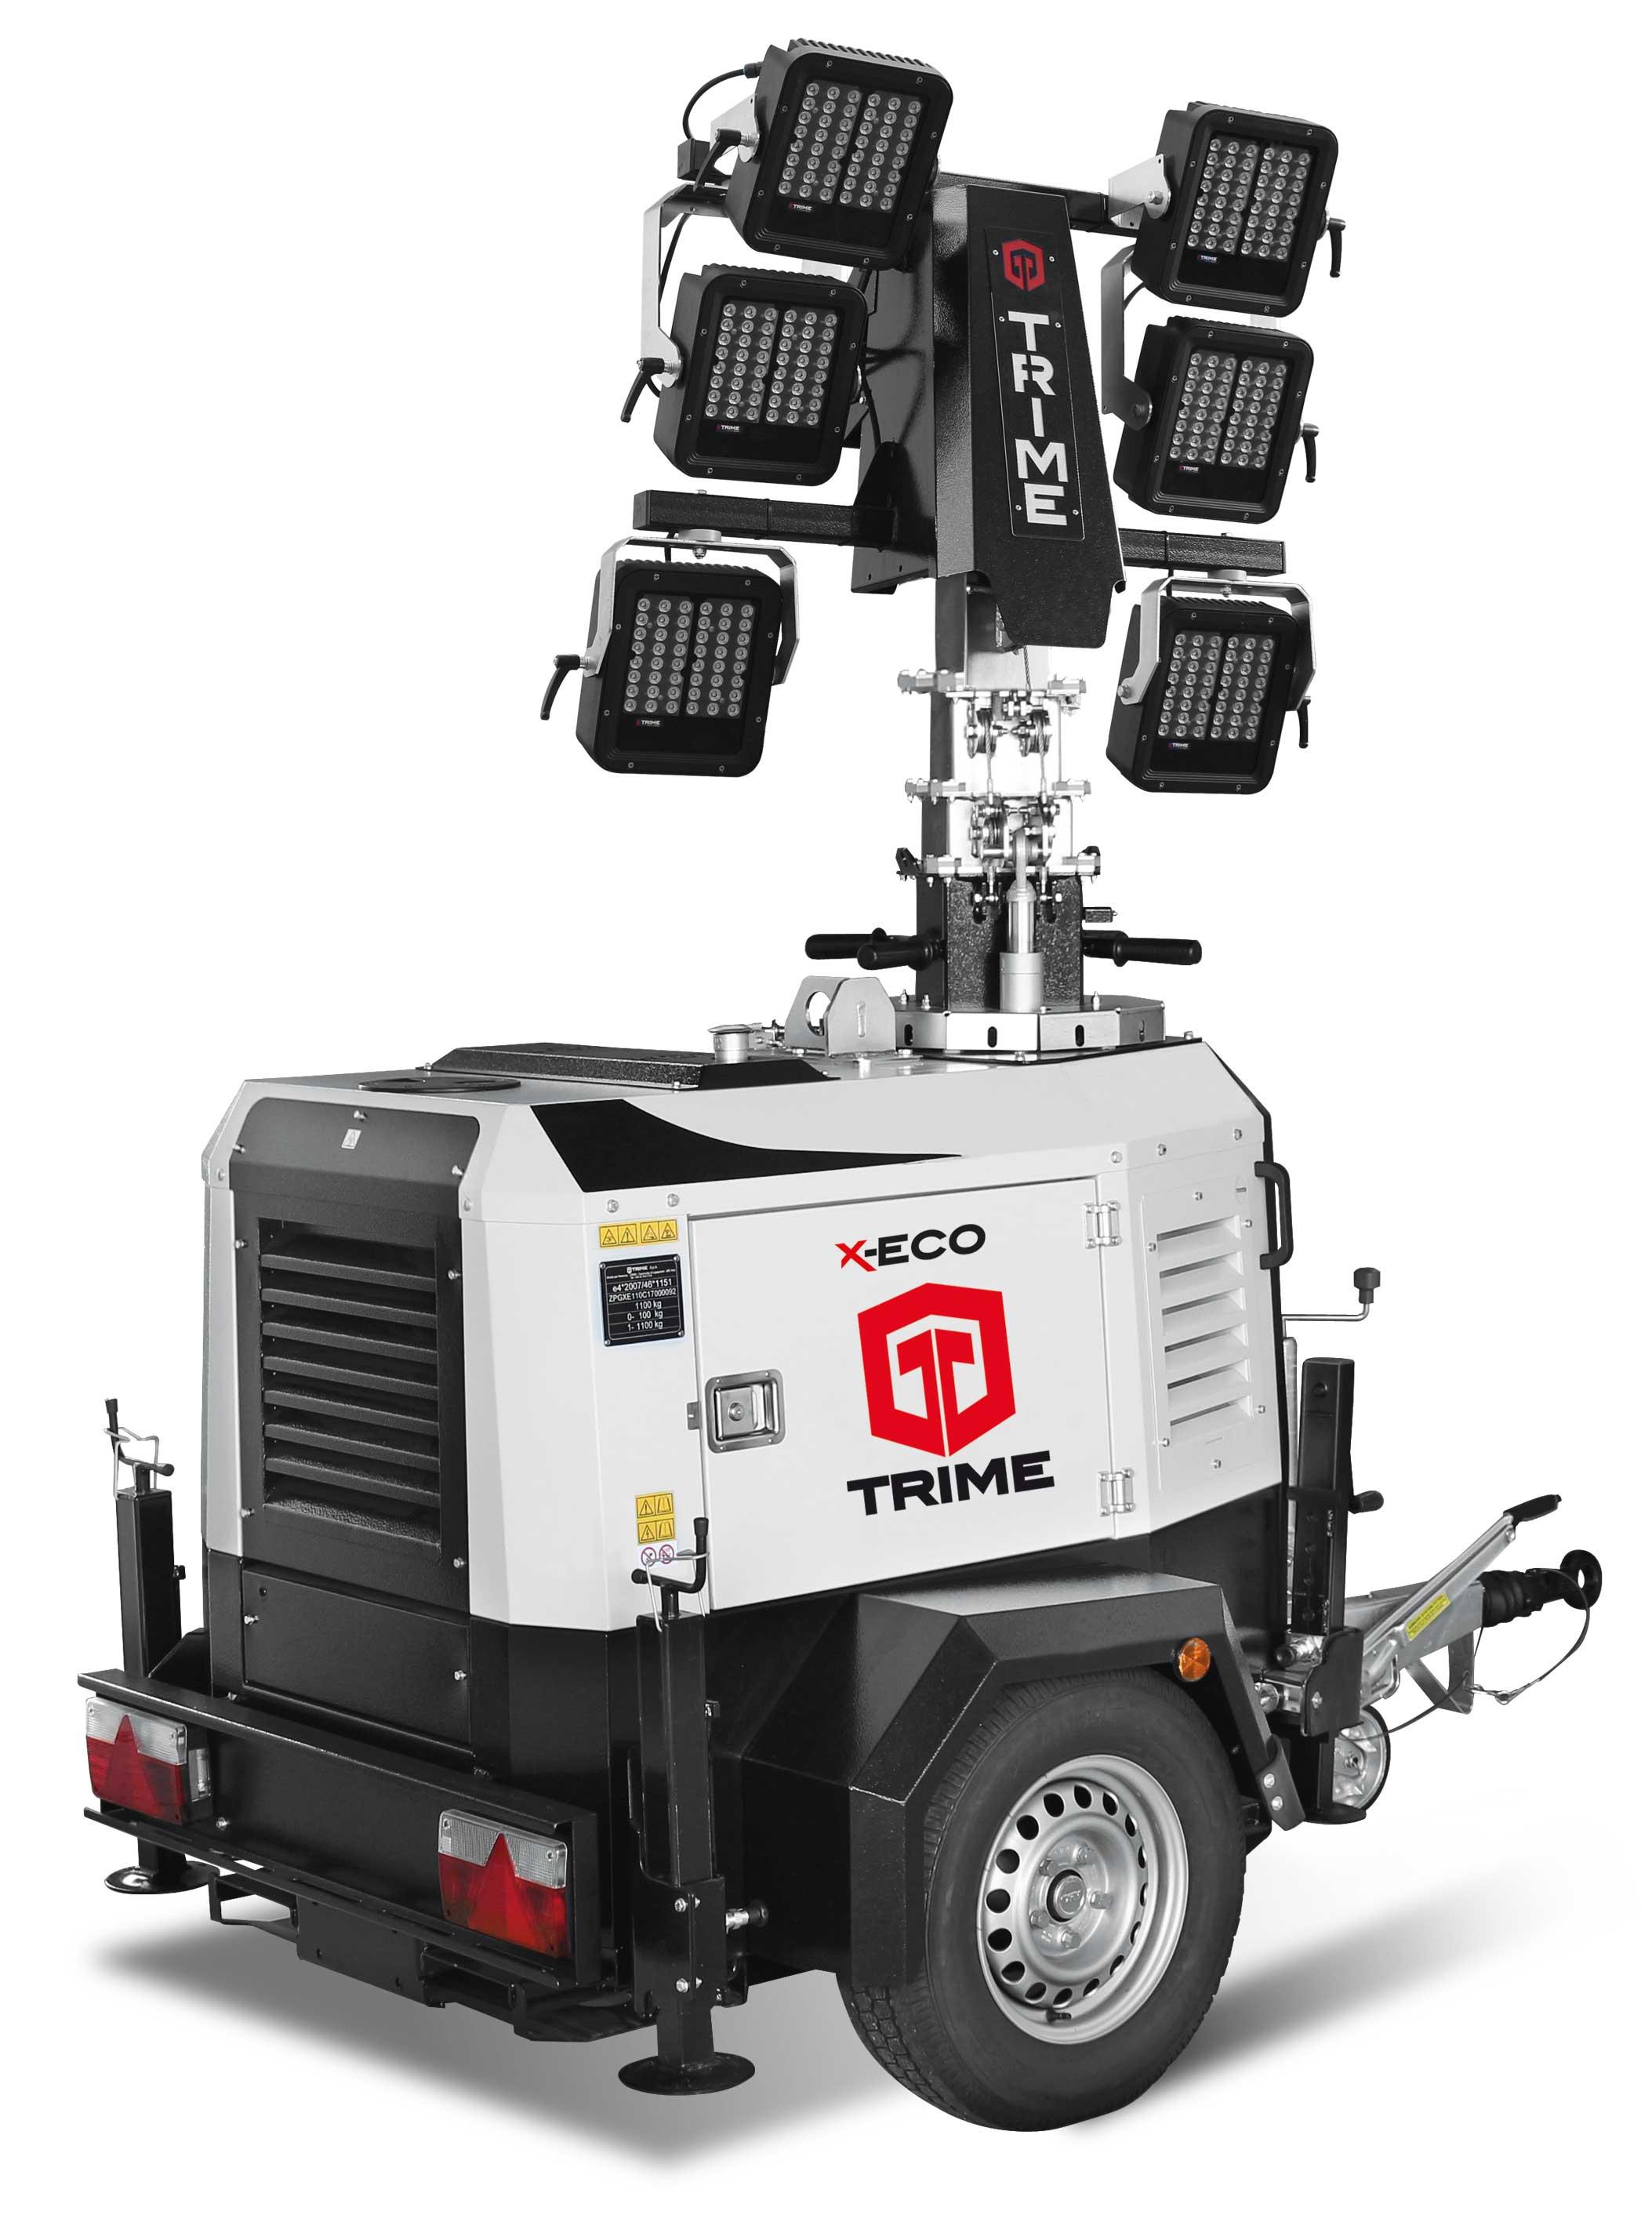 X-Eco - NEW TRIME LED HEADS